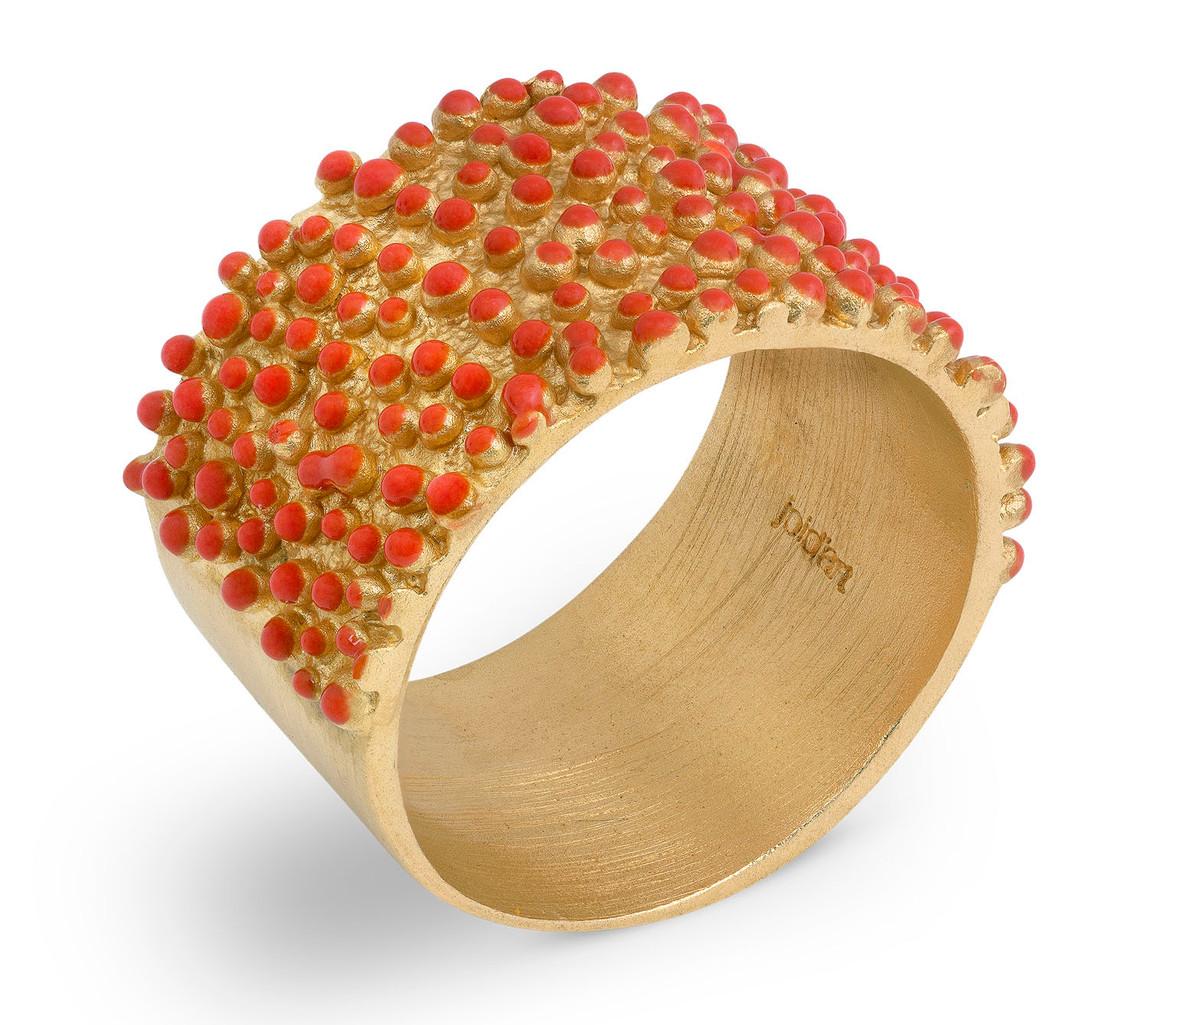 Joidart Estiu Ring Red Gold Size 7